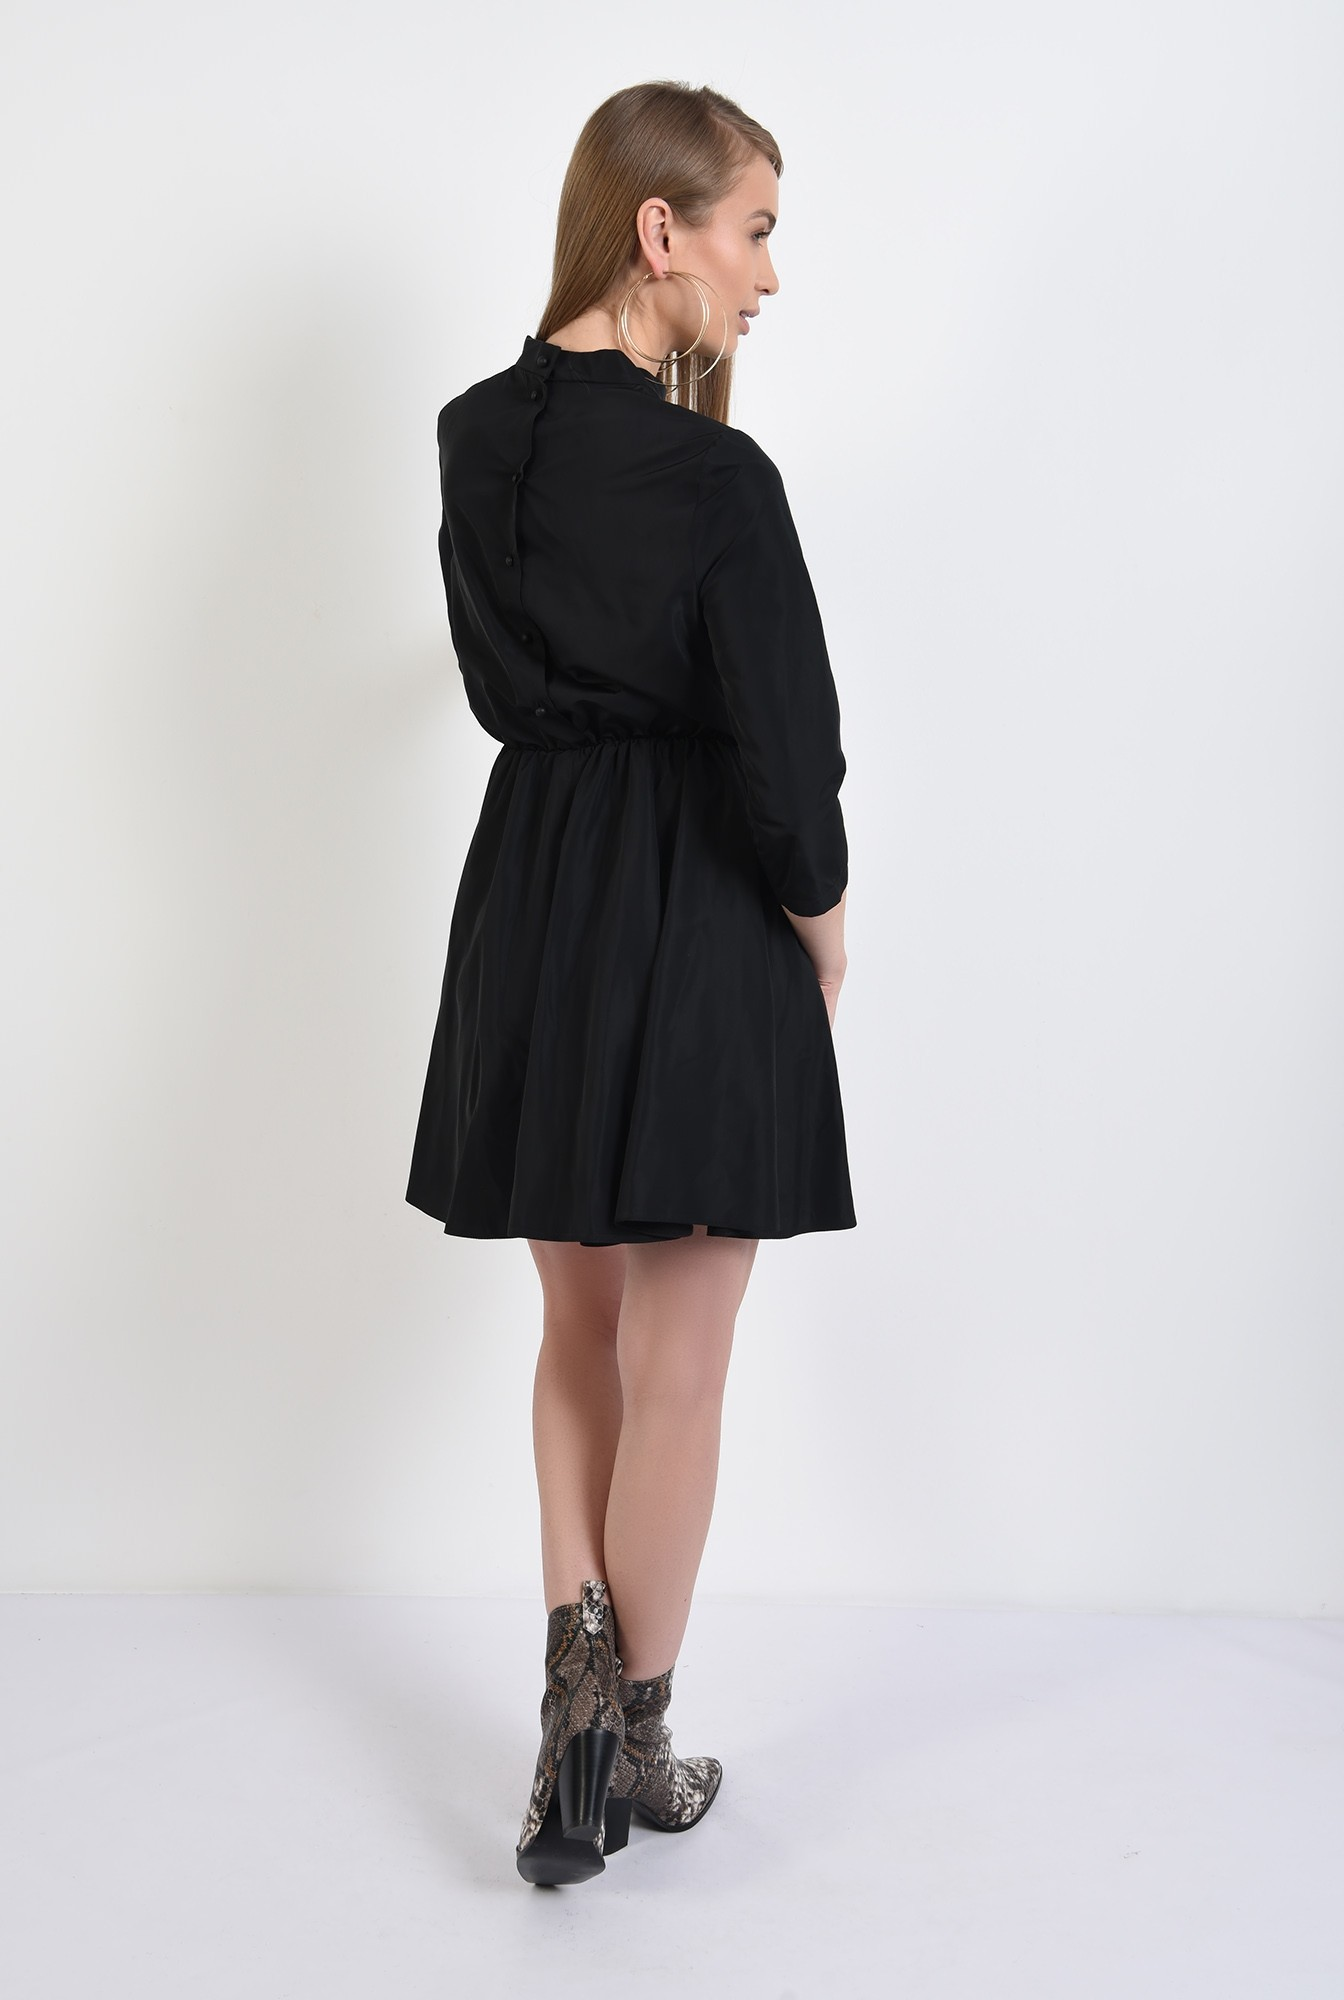 1 - rochie de primavara, mini, clos, guler, nasturi la spate, Poema